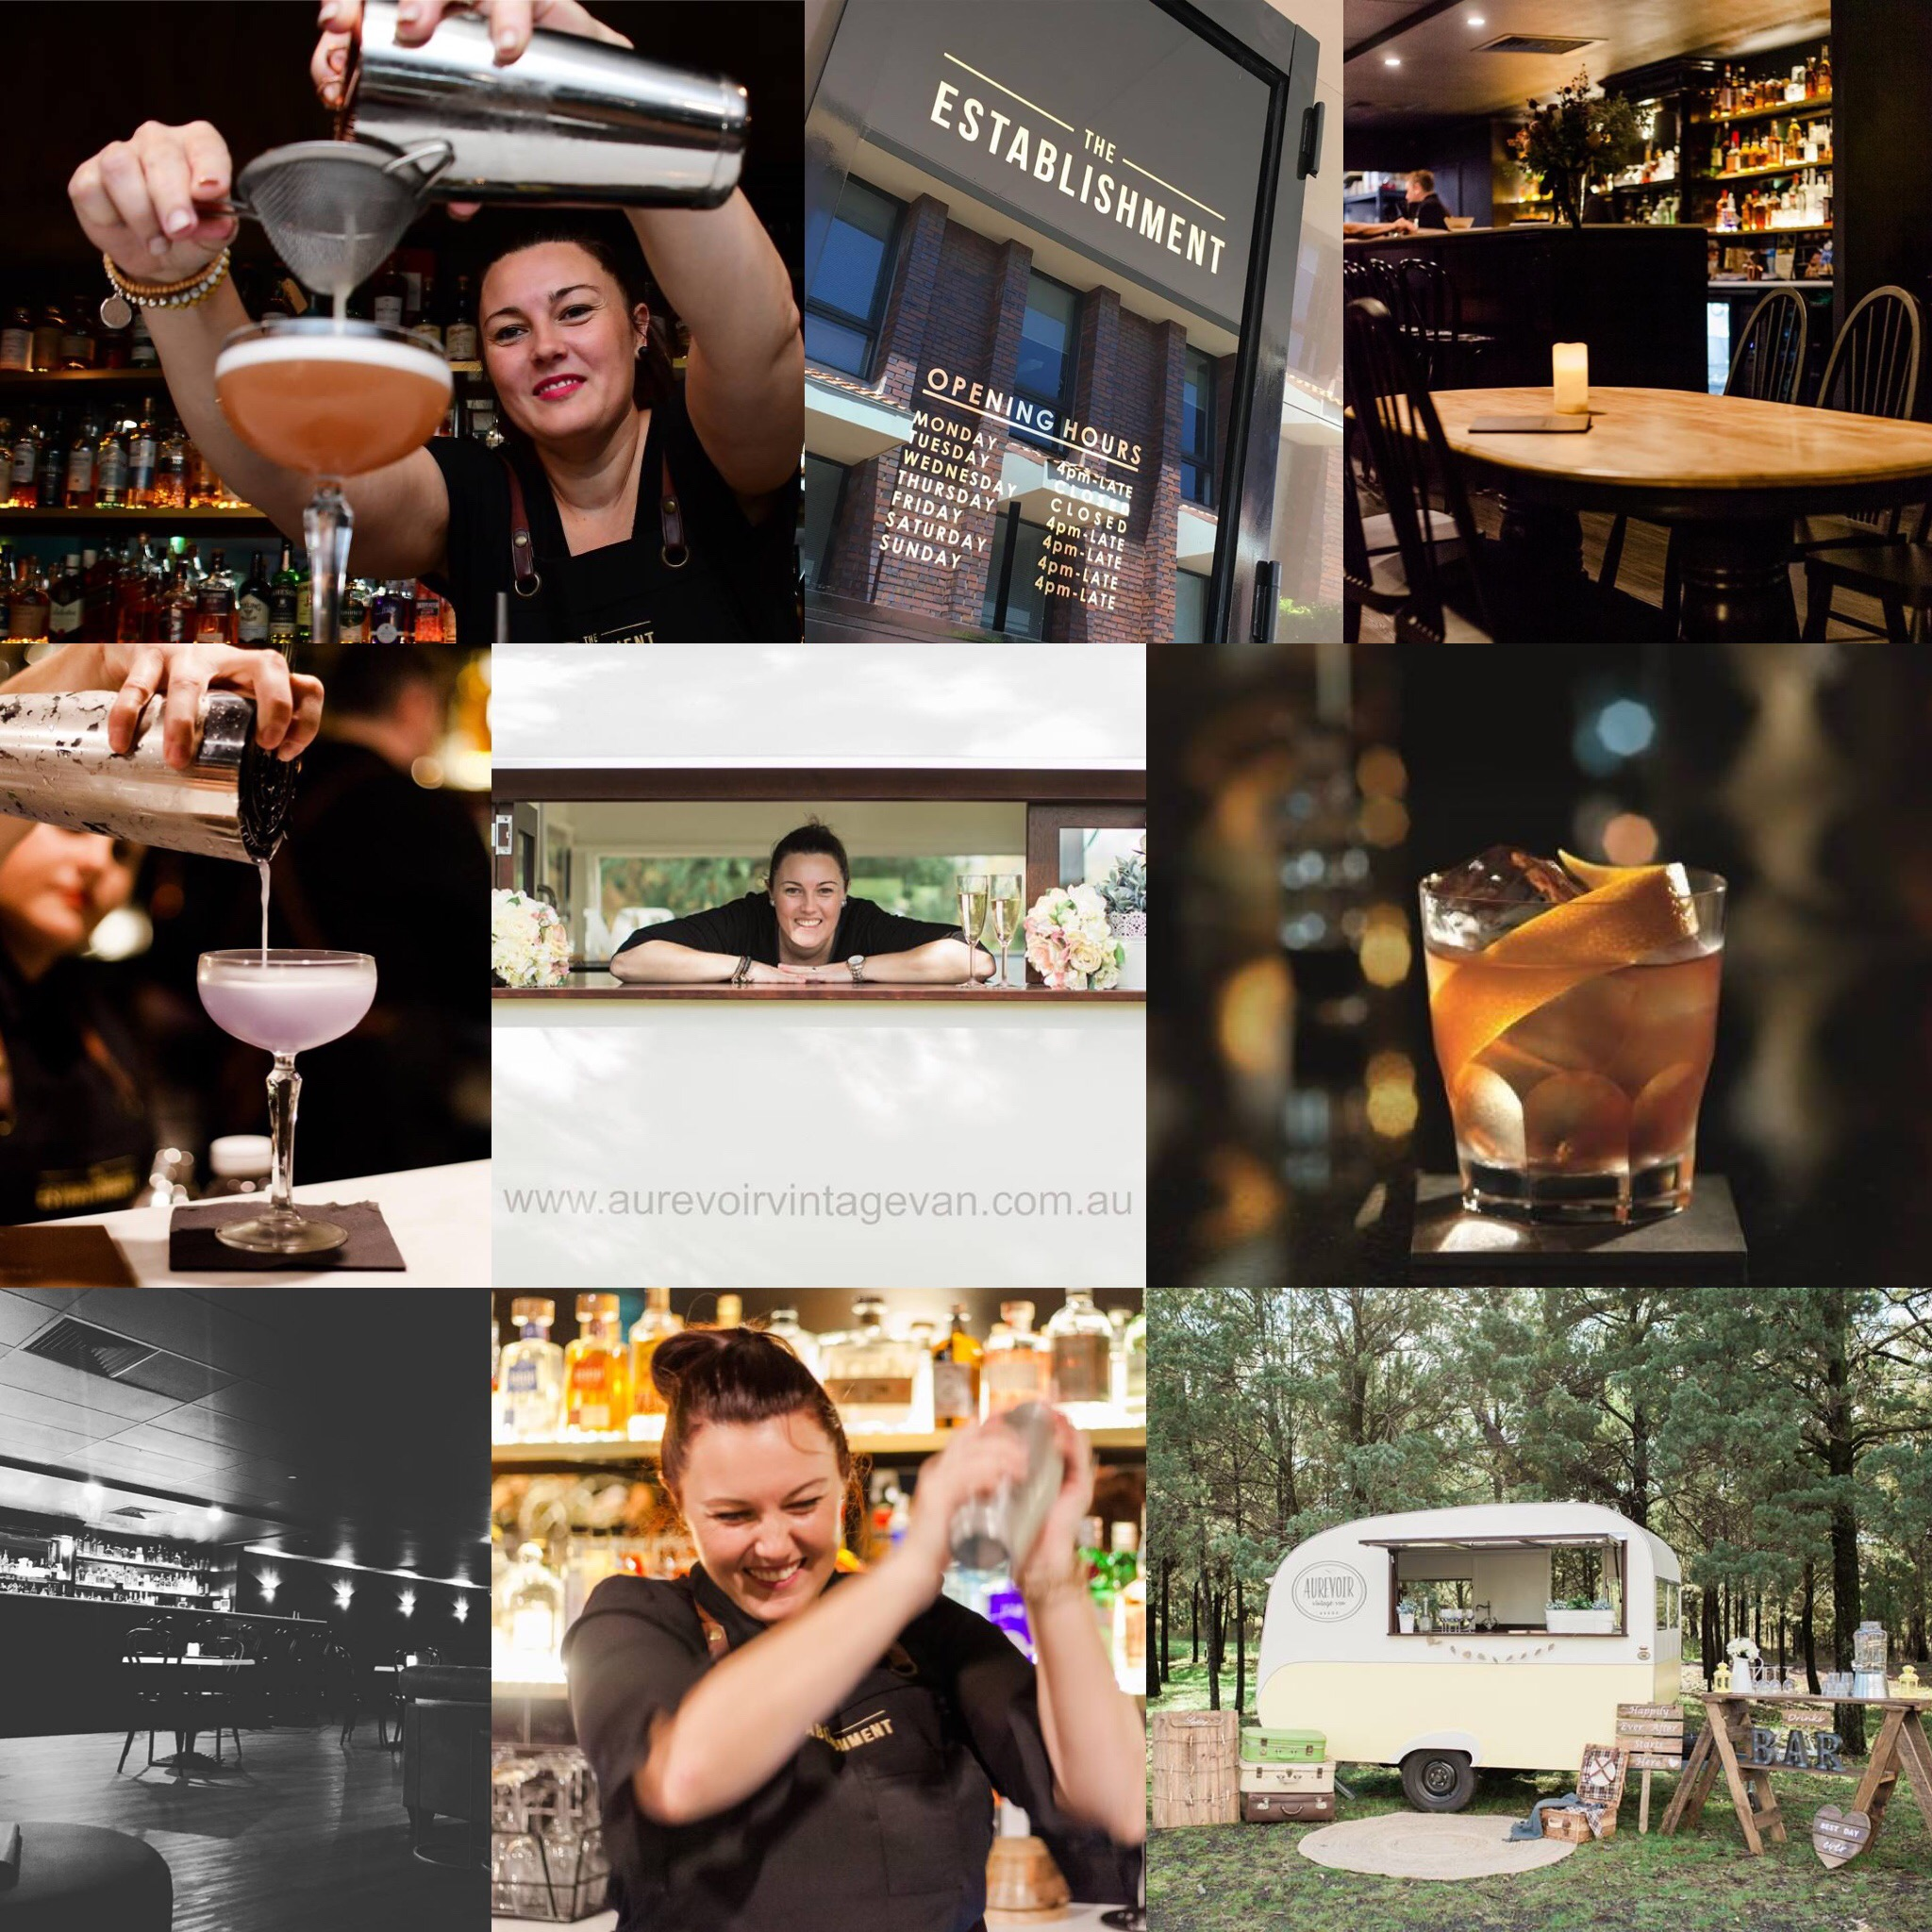 The Establishment Bar - AuRevoir Vintage Van - Tenelle Bond - Self Starter Podcast